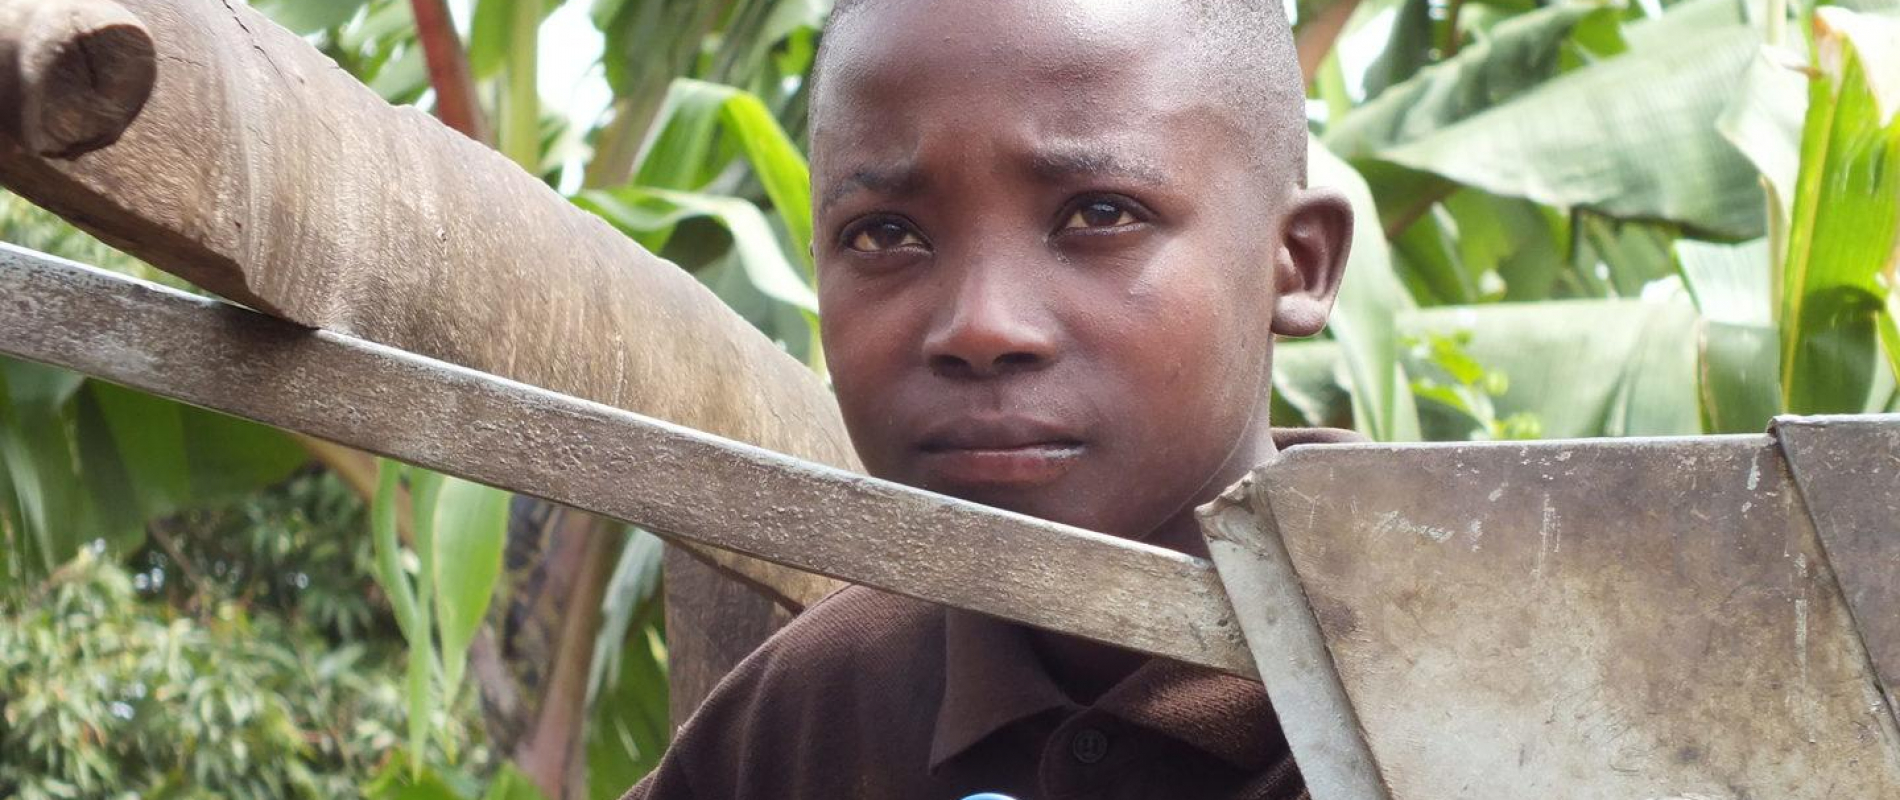 Watertime uganda